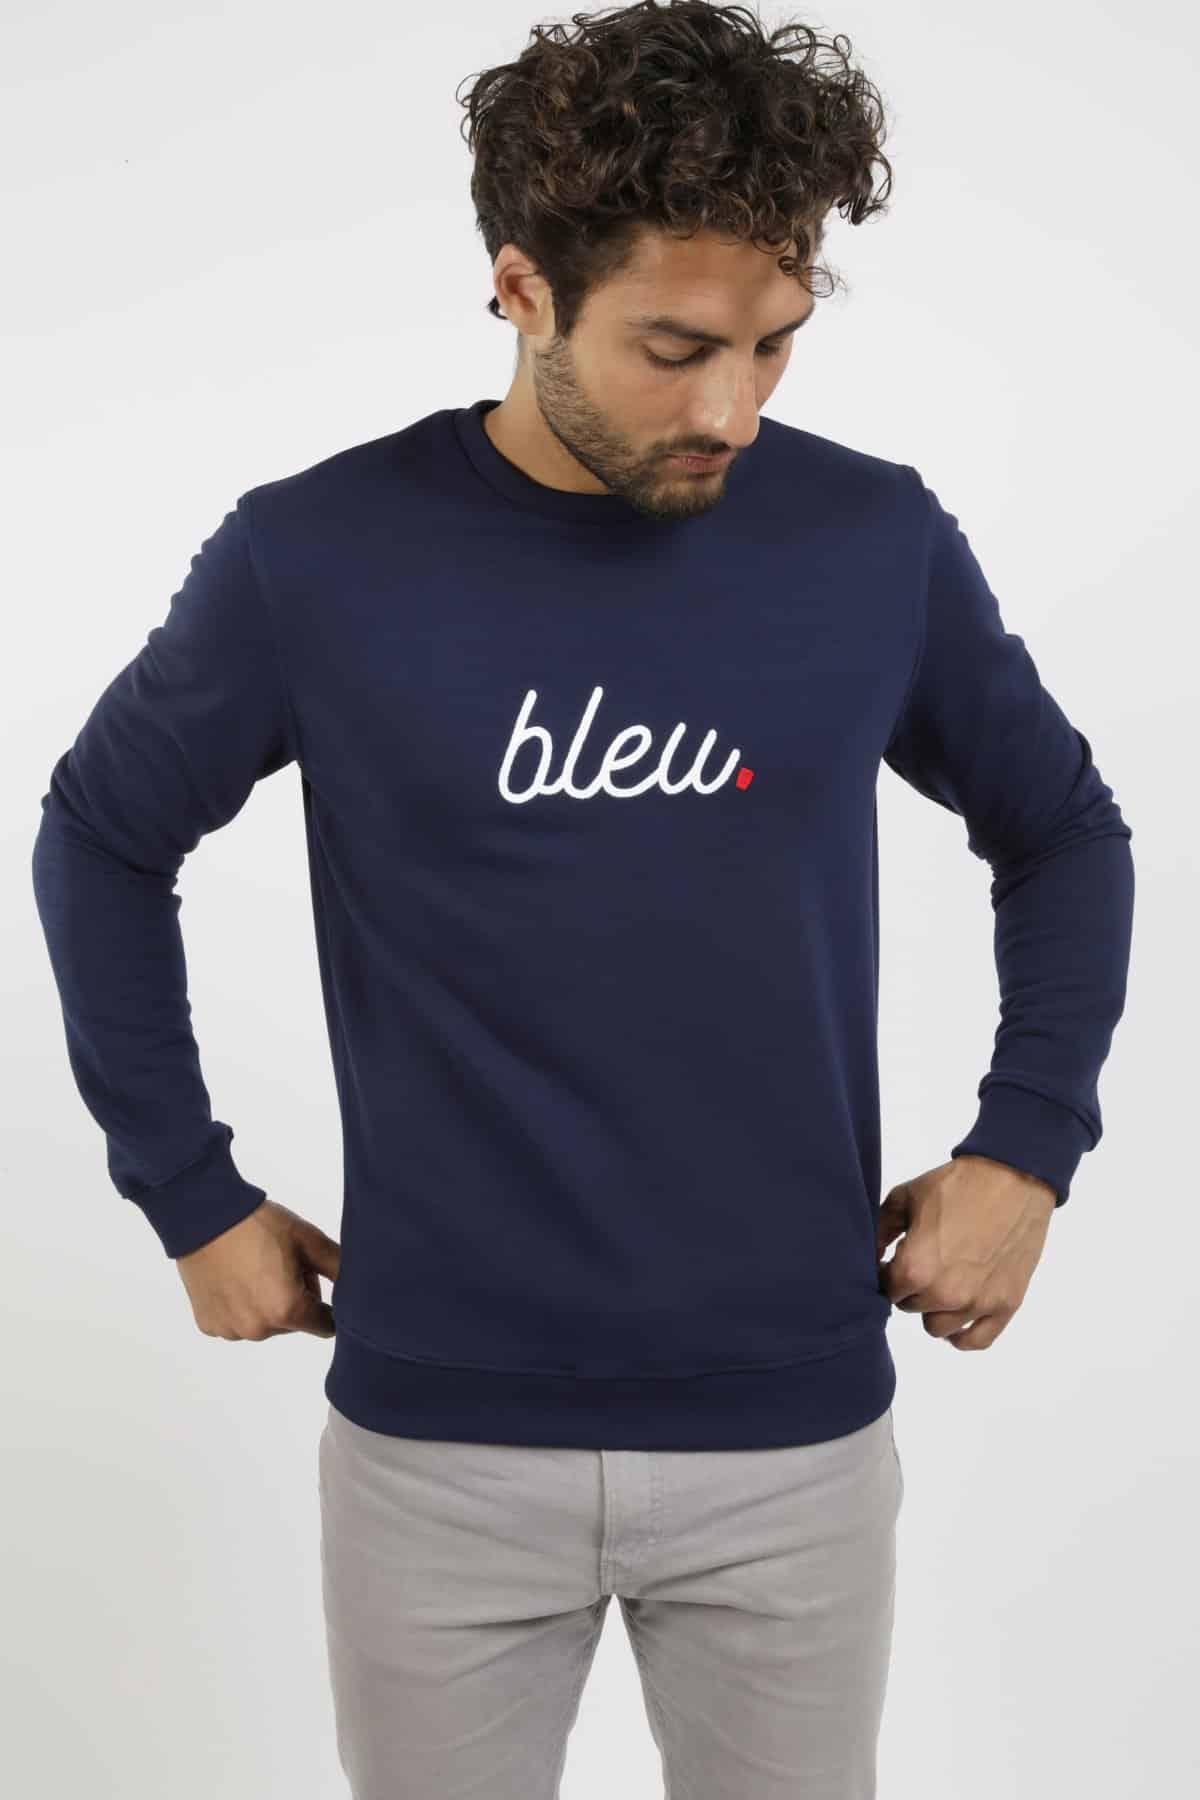 tee-shirt-kop-store-france-3